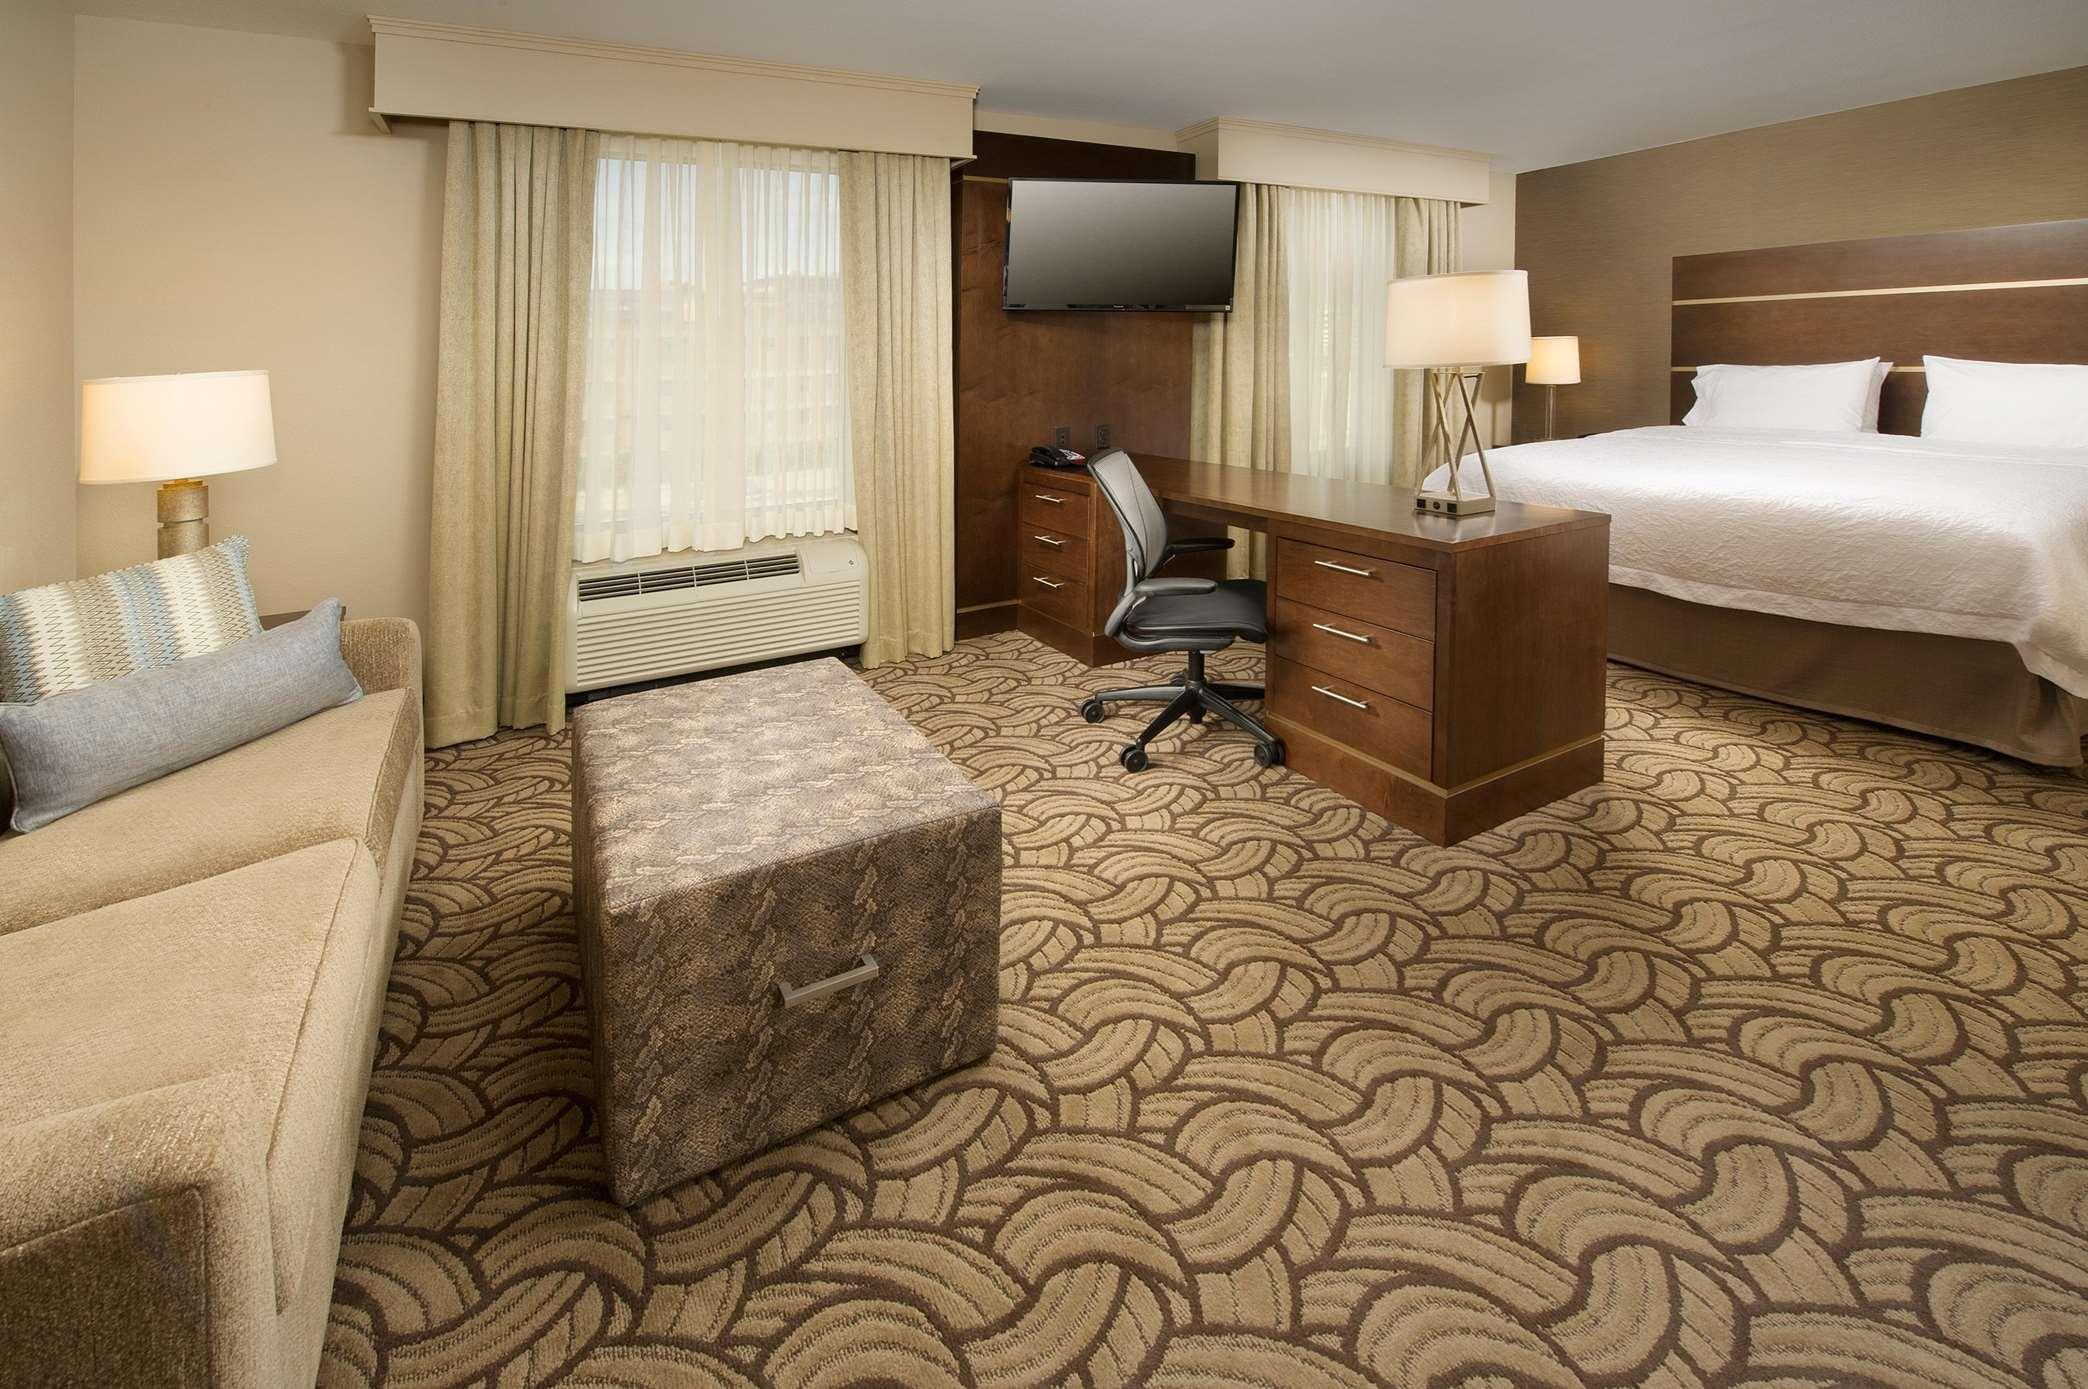 Hampton Inn & Suites San Antonio-Downtown/Market Square image 20